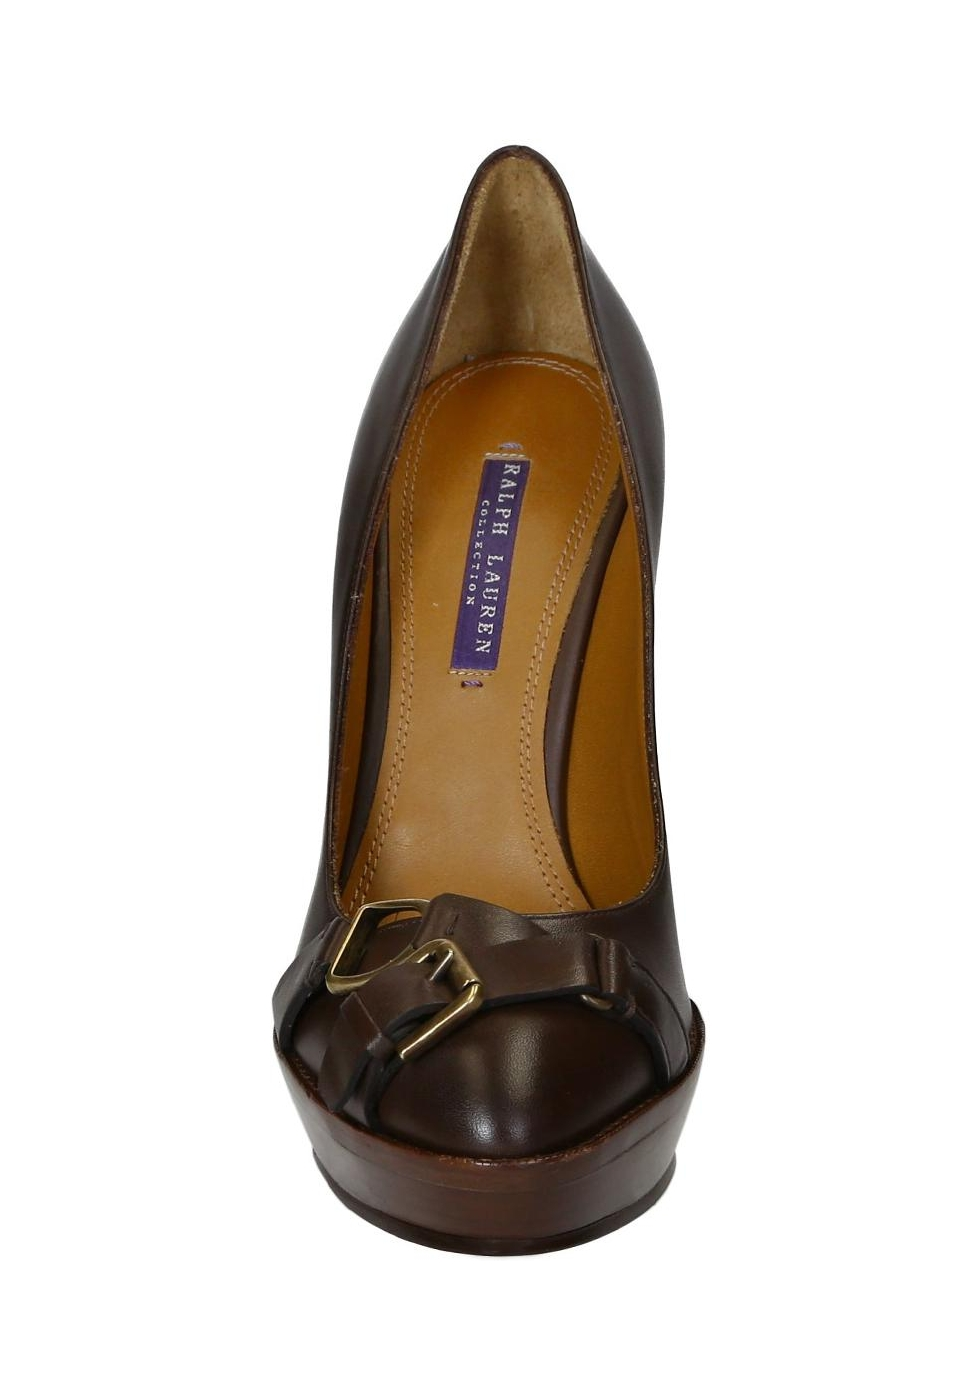 b3ce5bcf037 Ralf Lauren heeled pumps with platform in brown leather - Italian ...